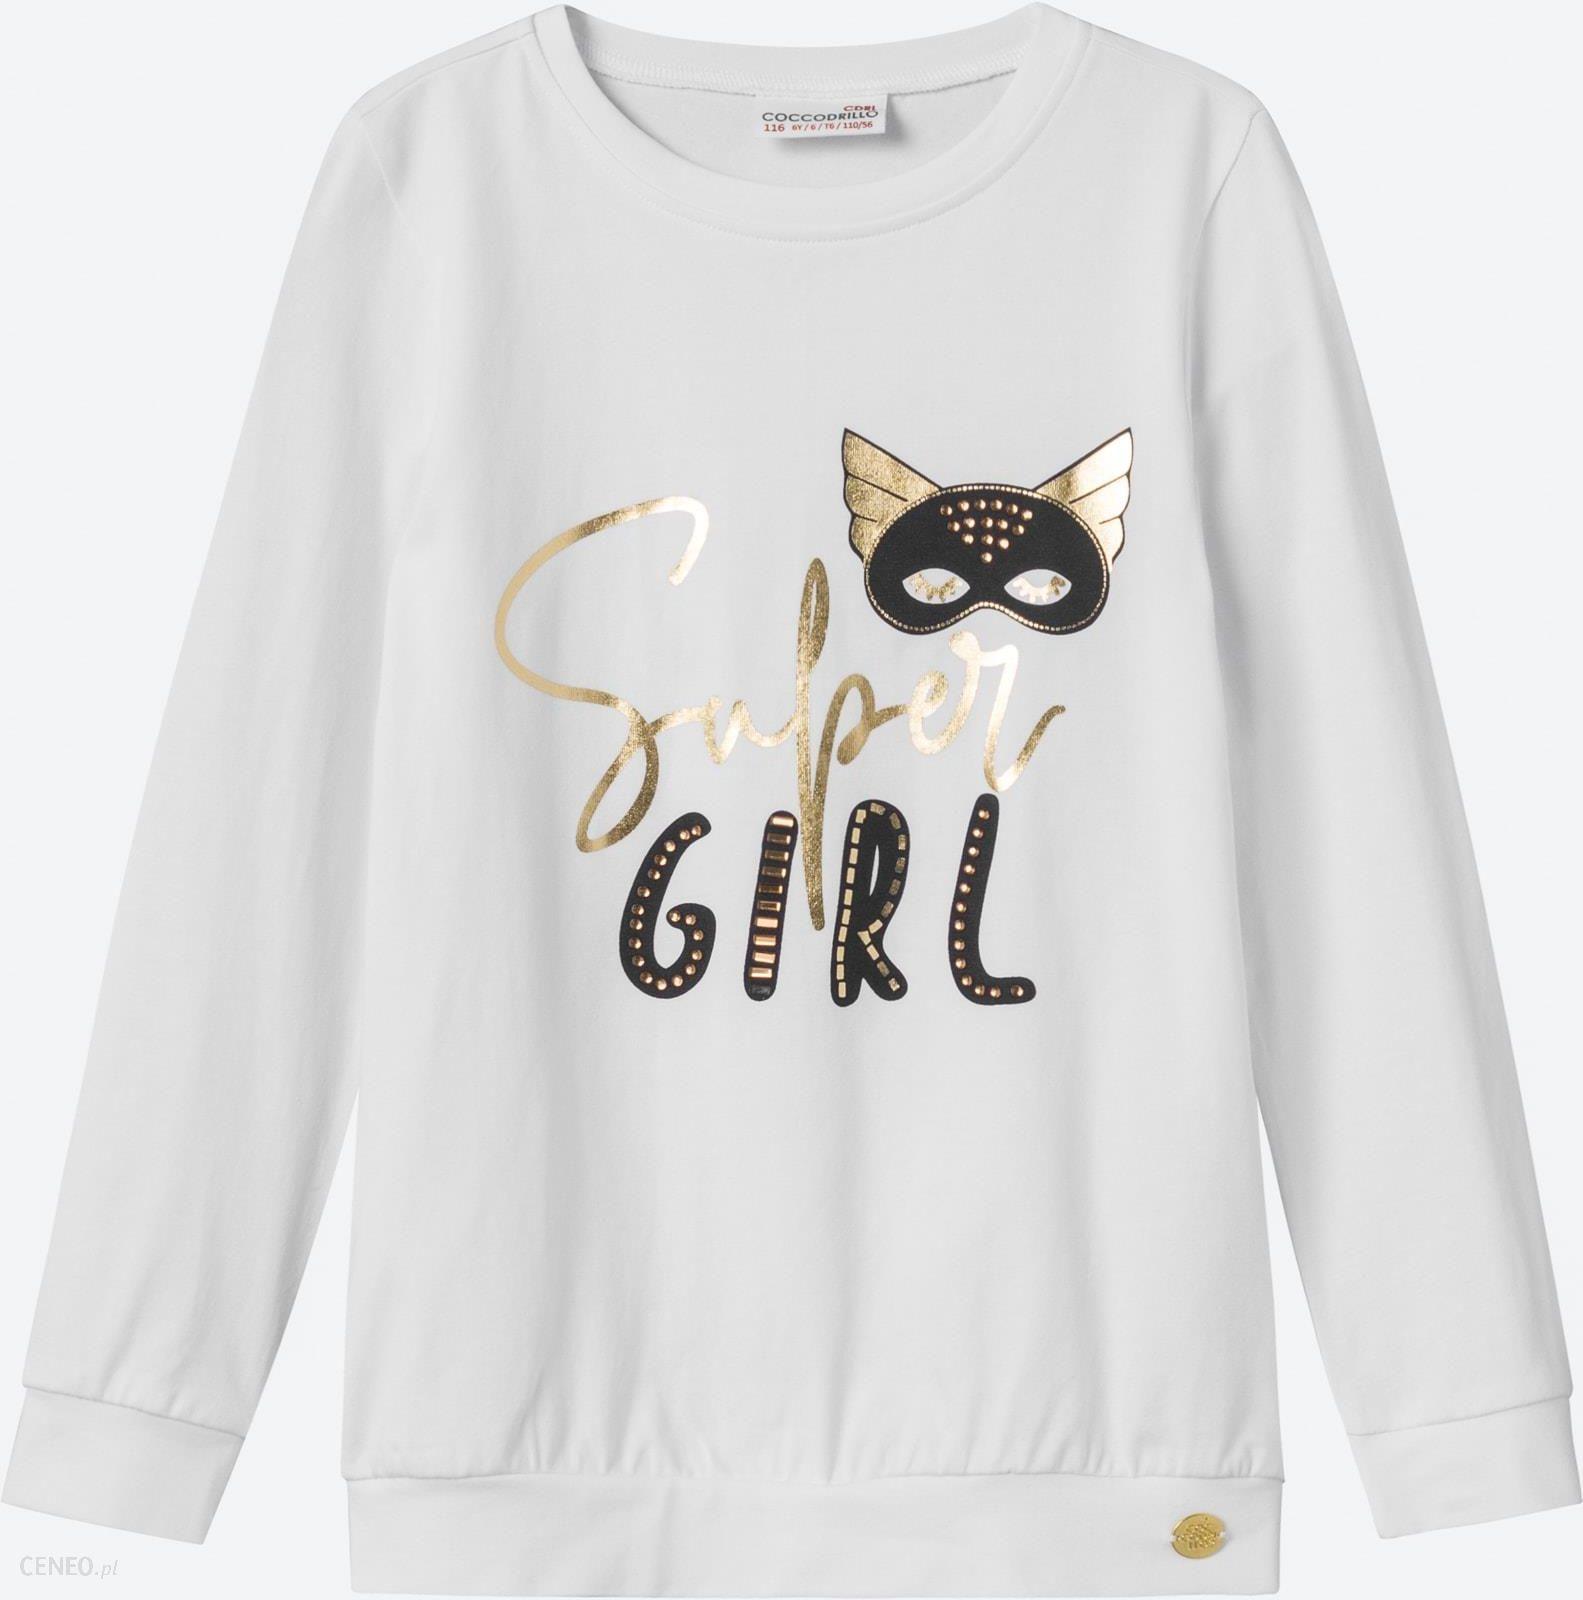 Bluza dla dziewczynki Coccodrillo WONDER GIRL Ceny i